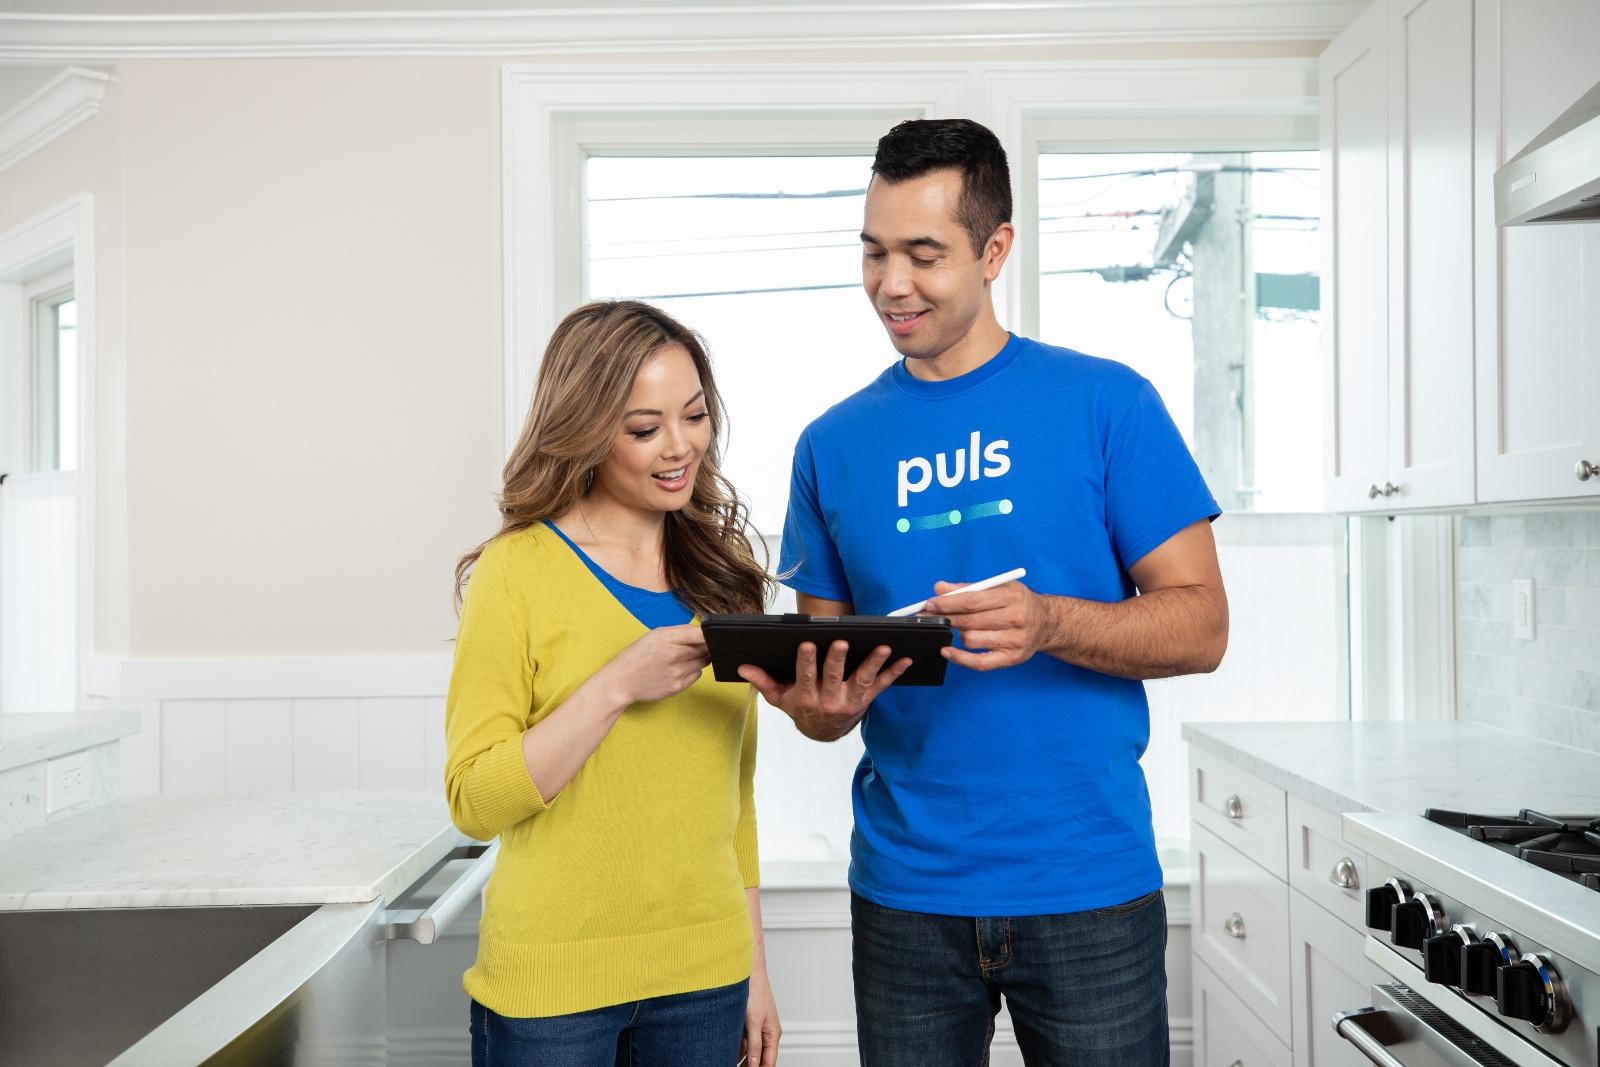 Puls refrigerator repair company